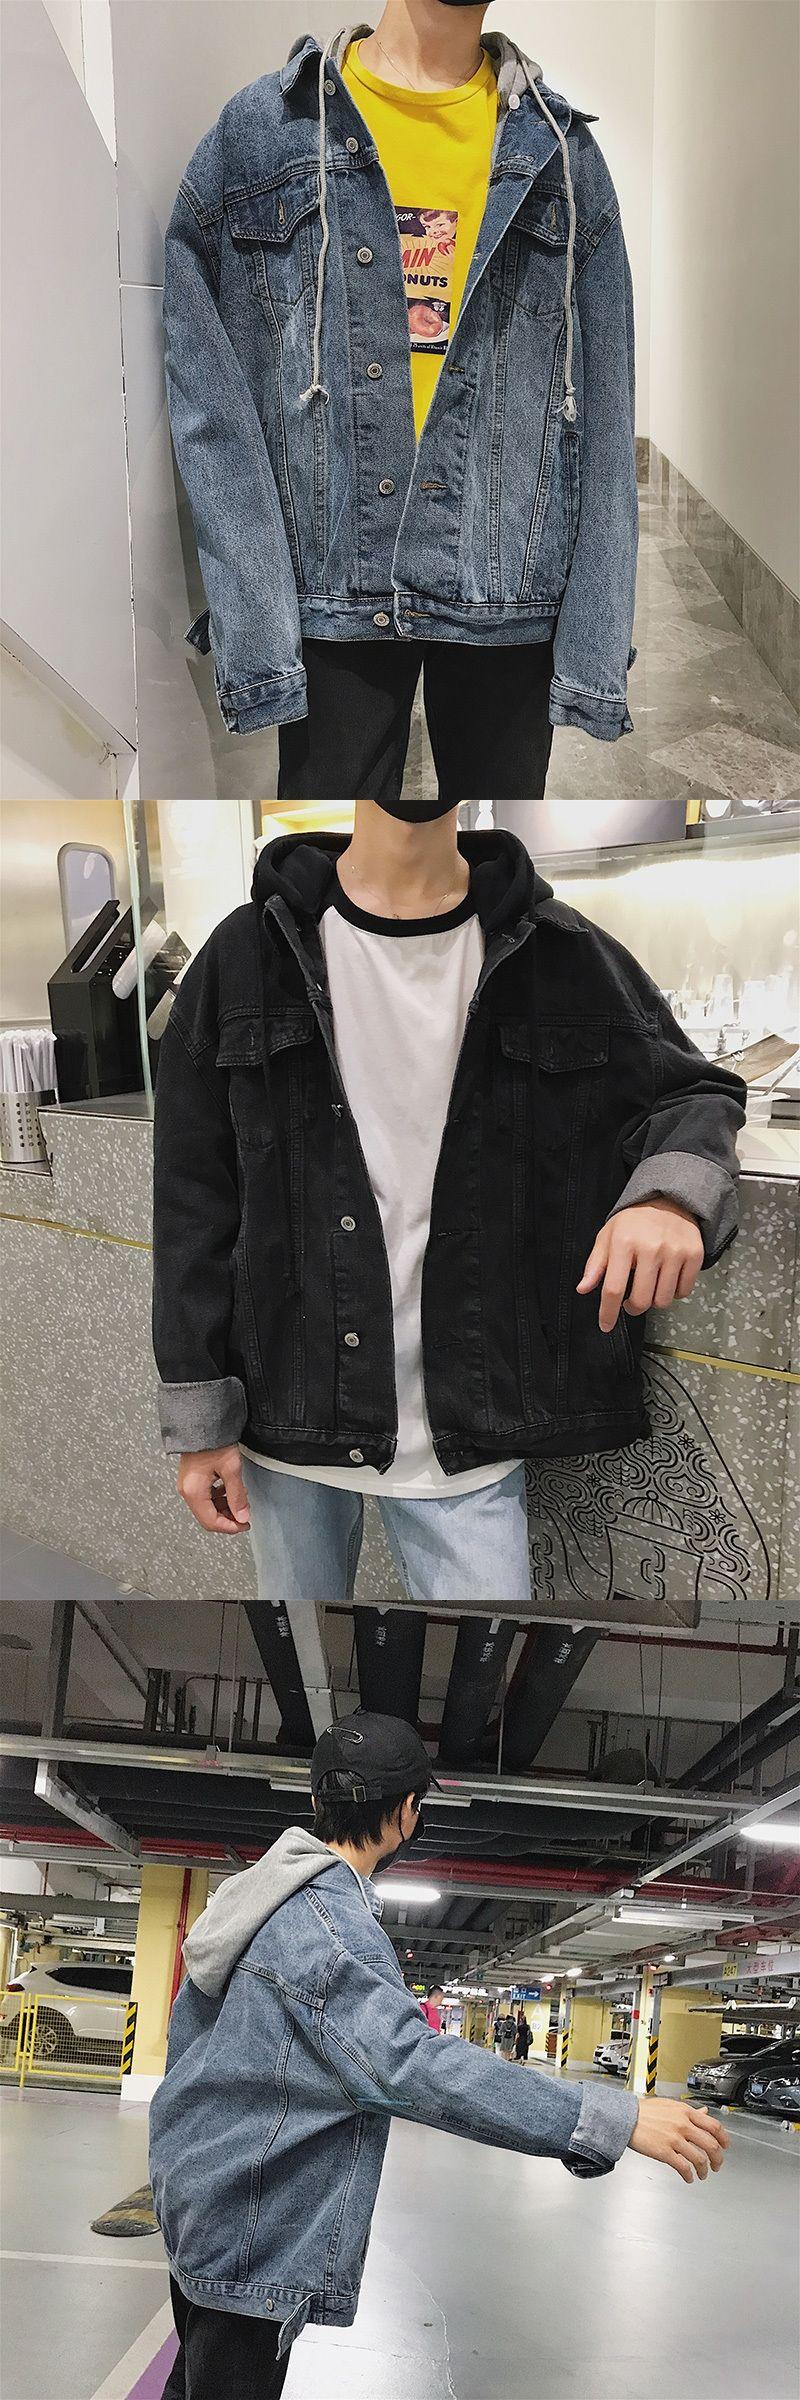 93b374807ee81 2017 Autumn Winter Loose Denim Coat Fashion Casual Hooded Outwear Retro  Clothes Baseball Motorcycle Men Jacket